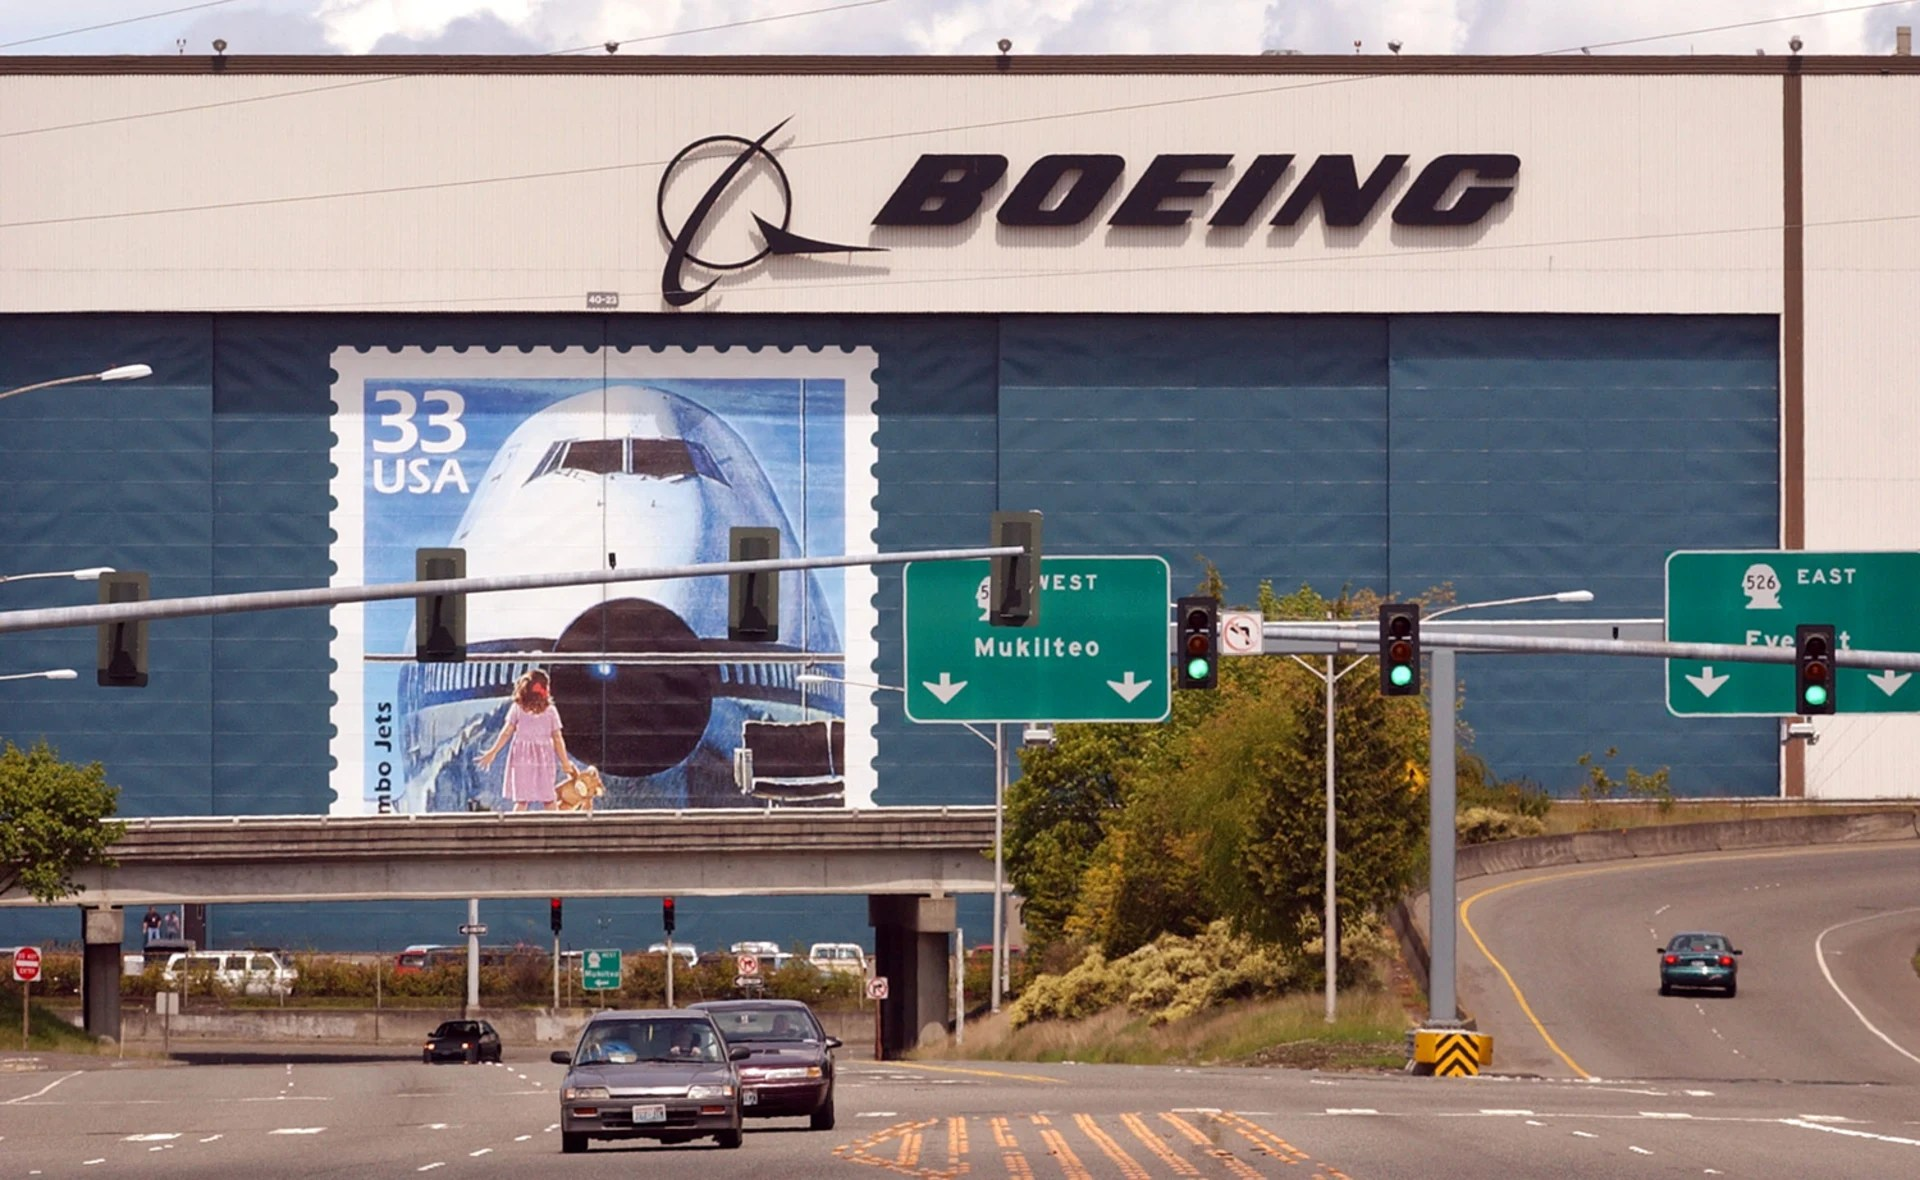 Resultado de imagen para Boeing plant everett